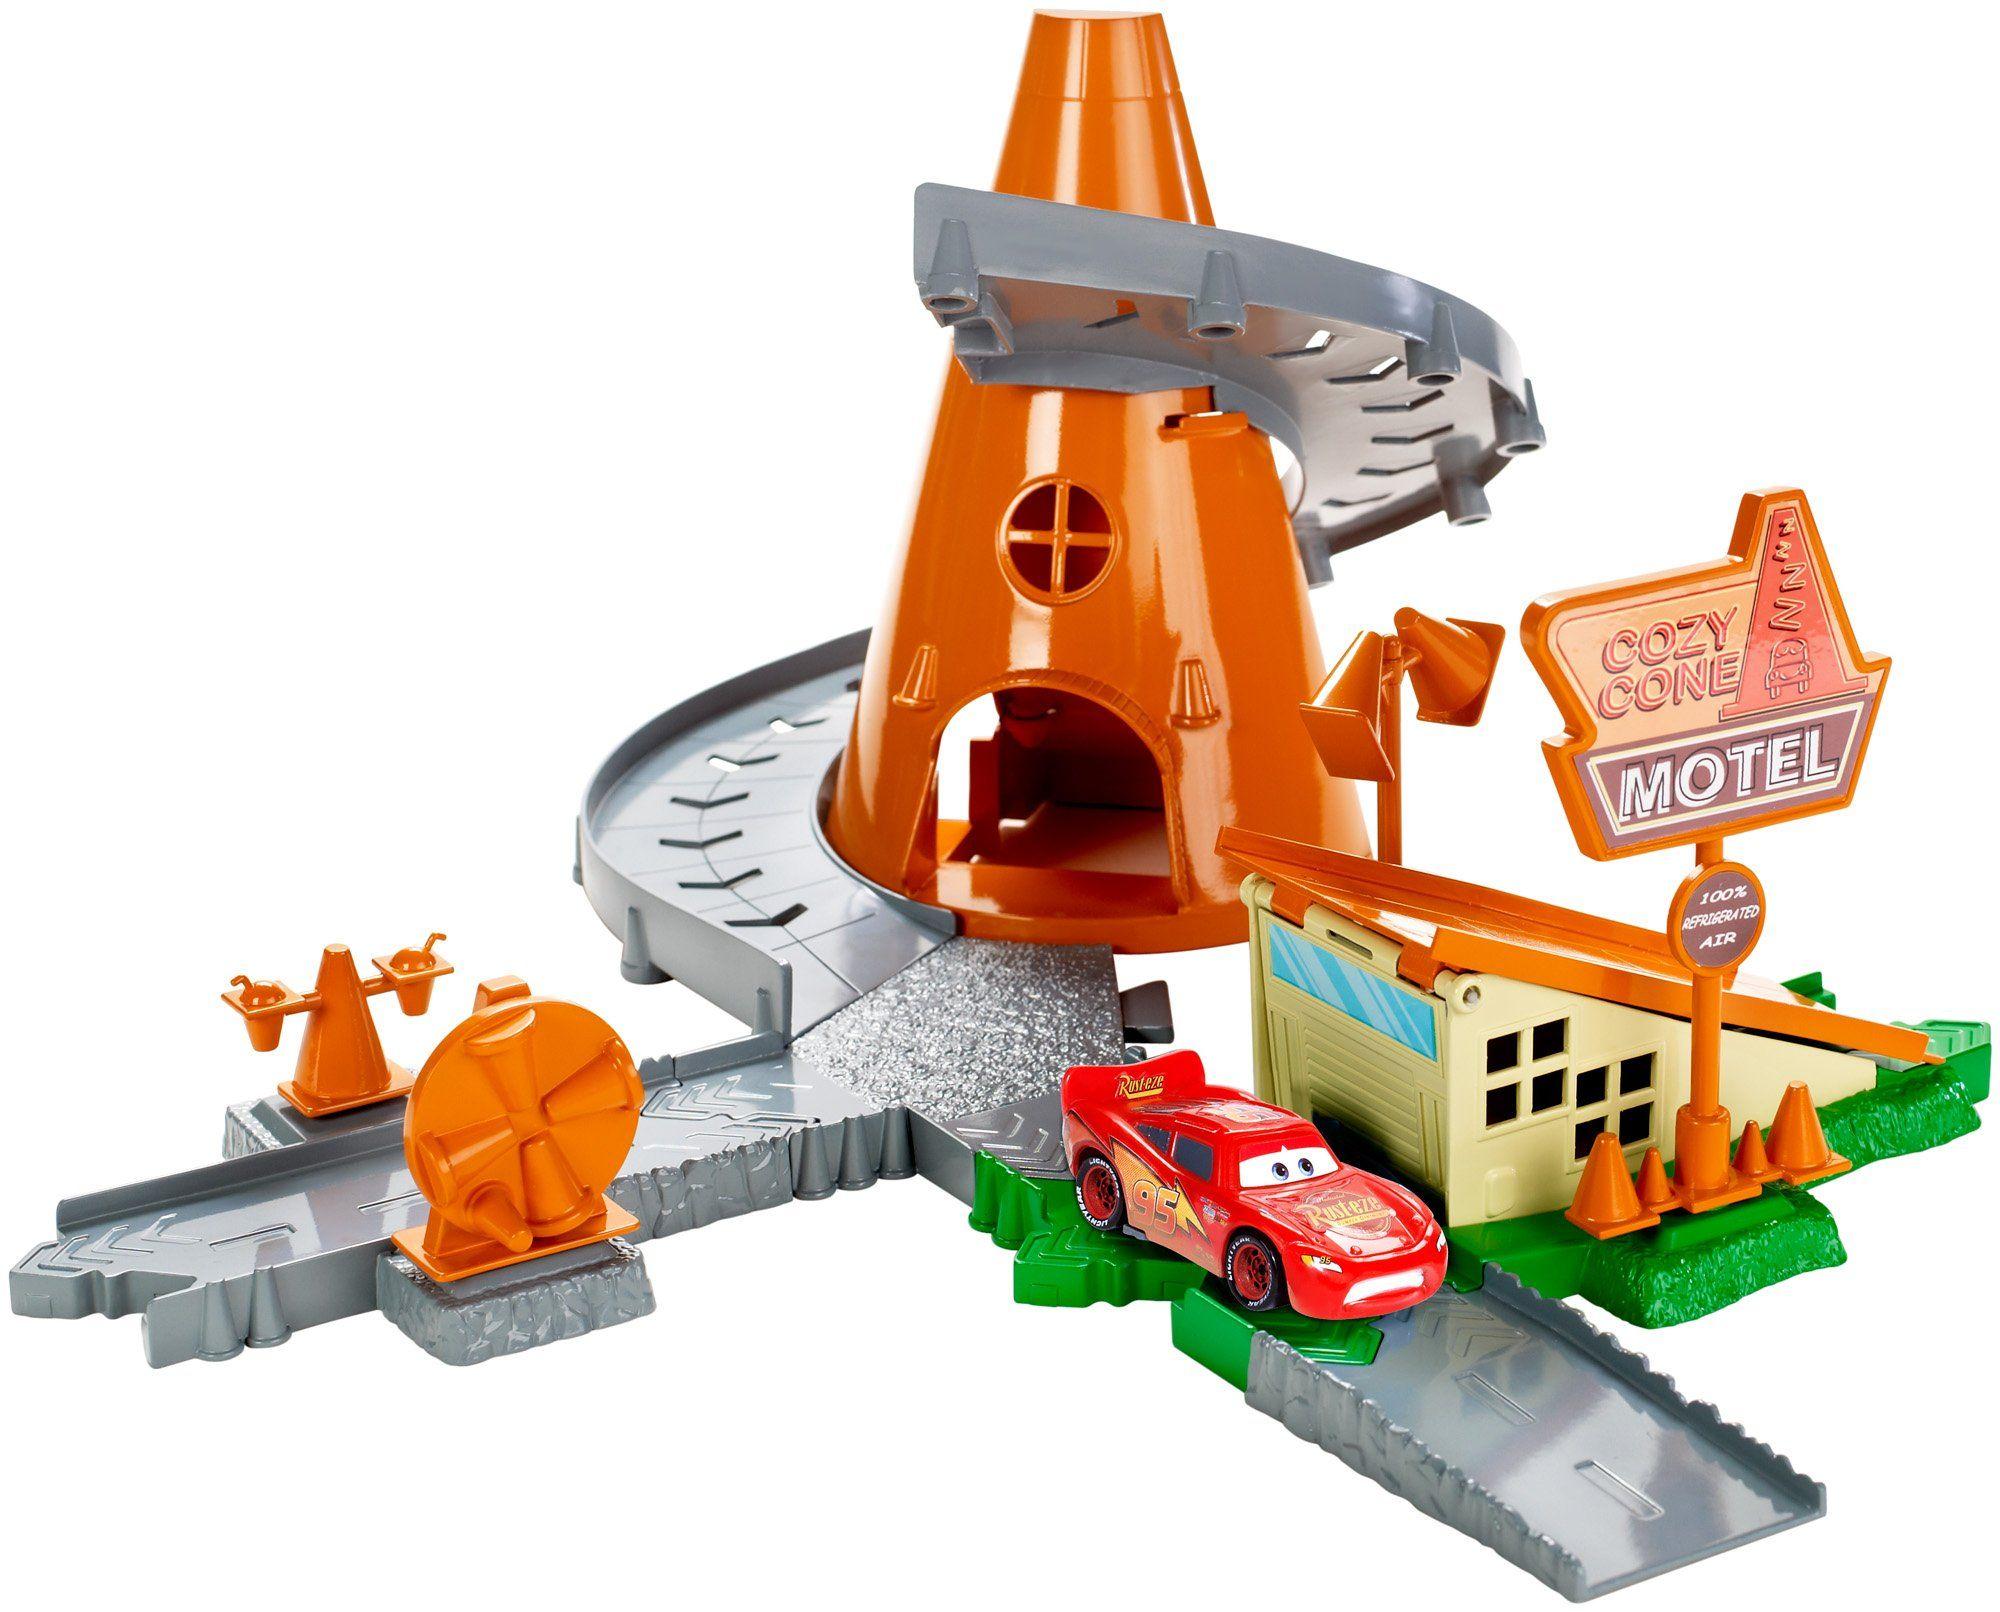 Disney/Pixar Cars Radiator Springs Cozy Cone